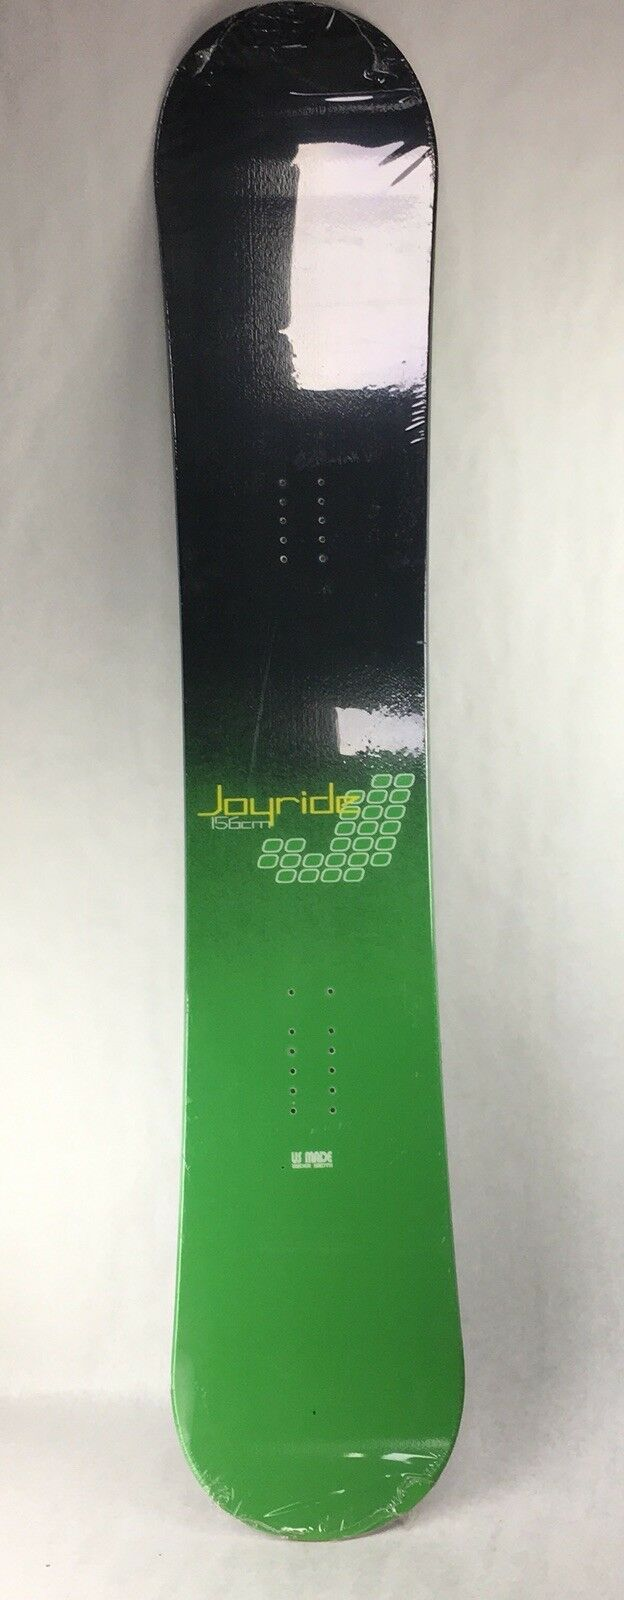 Extremely rare Vintage Joyride snowboard 156mm